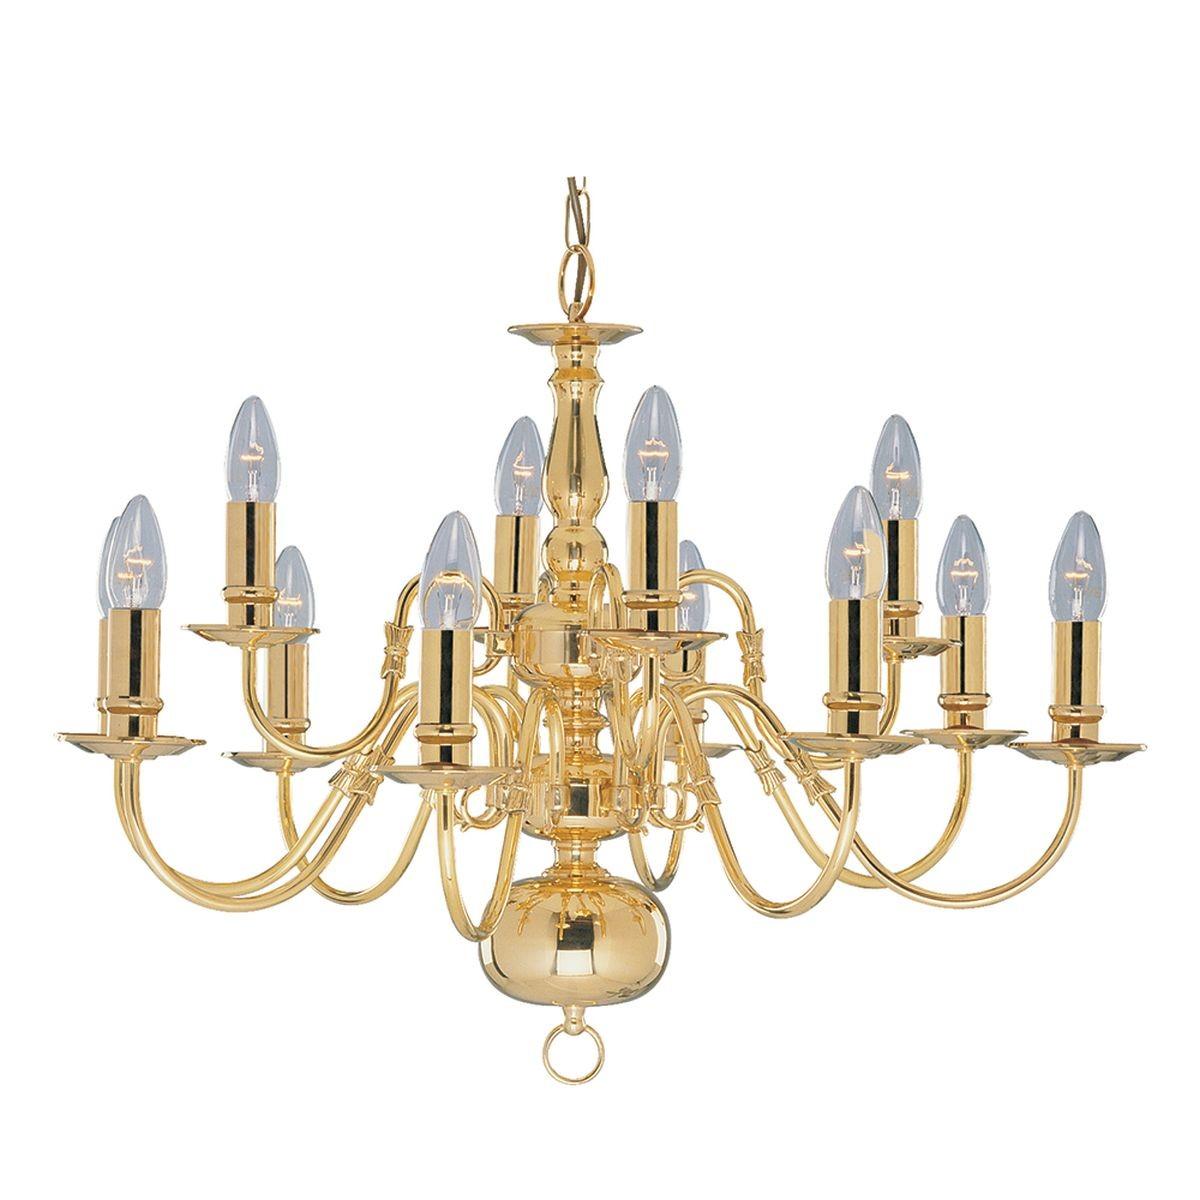 Marquee chandelier hire dorset devon somerset marquee 12 arm 2 tier chandelier aloadofball Image collections